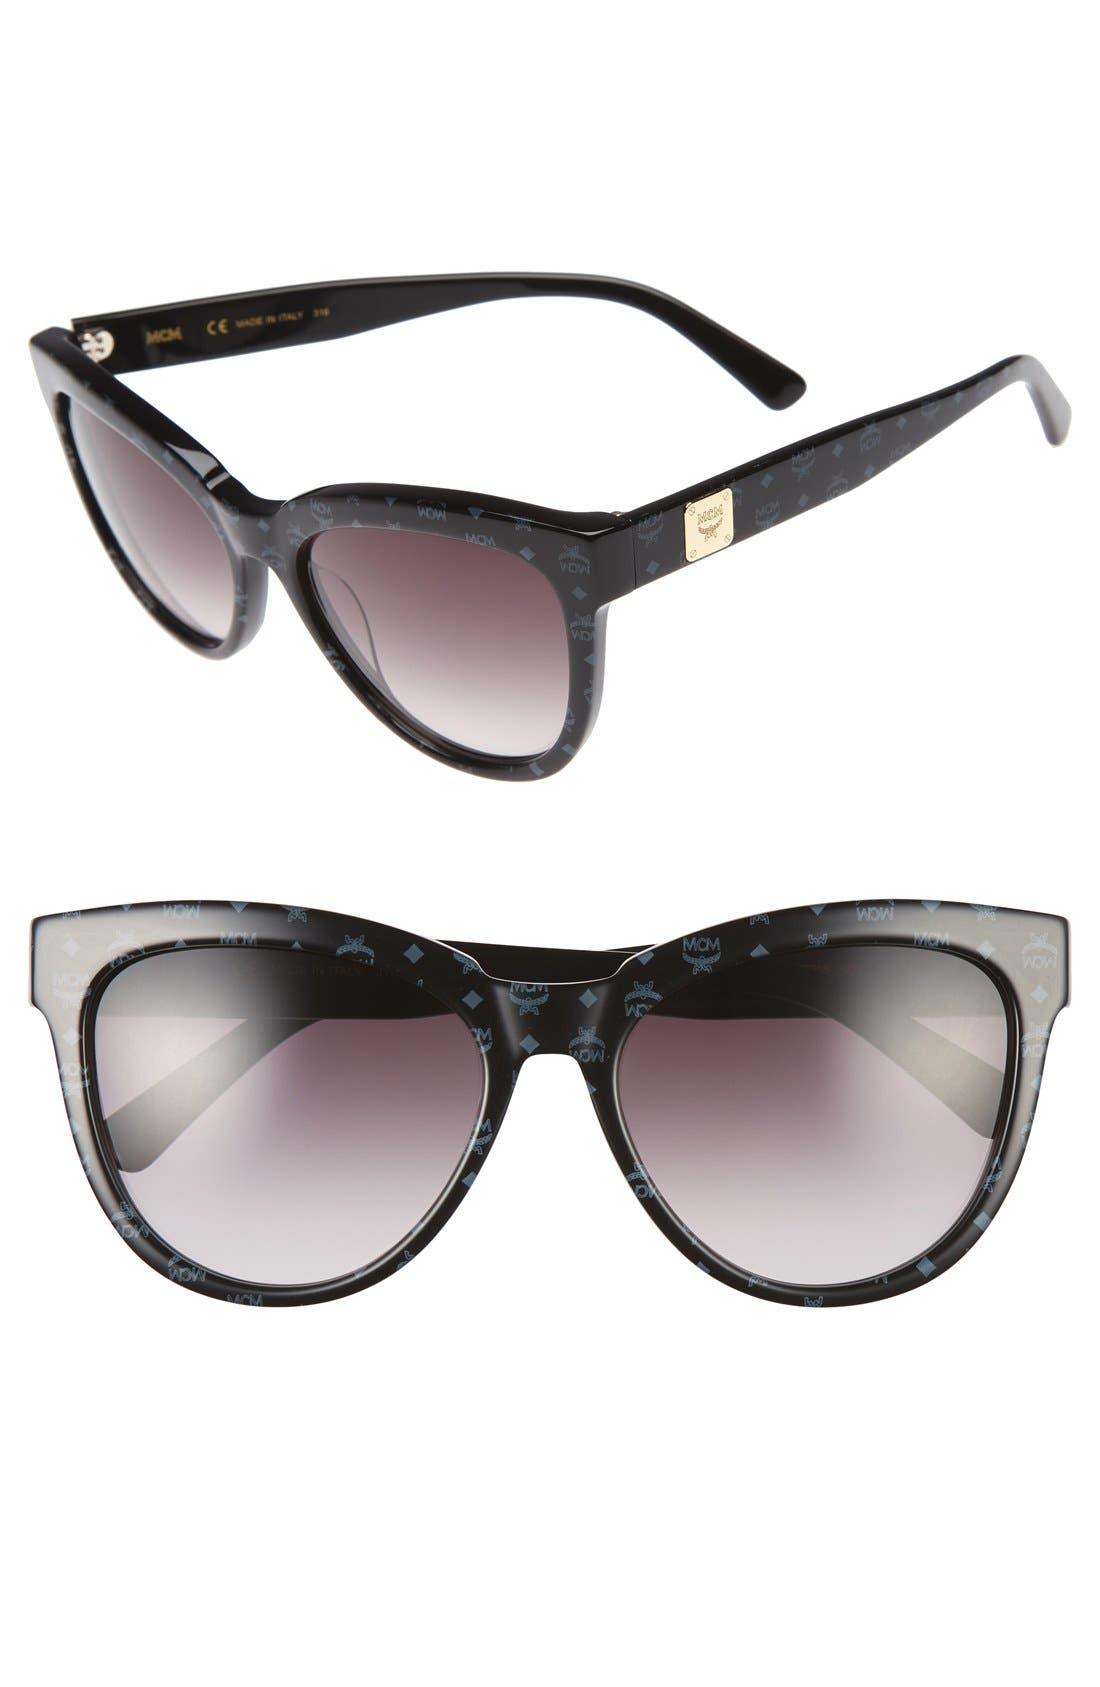 56mm Retro Sunglasses,                             Main thumbnail 1, color,                             006